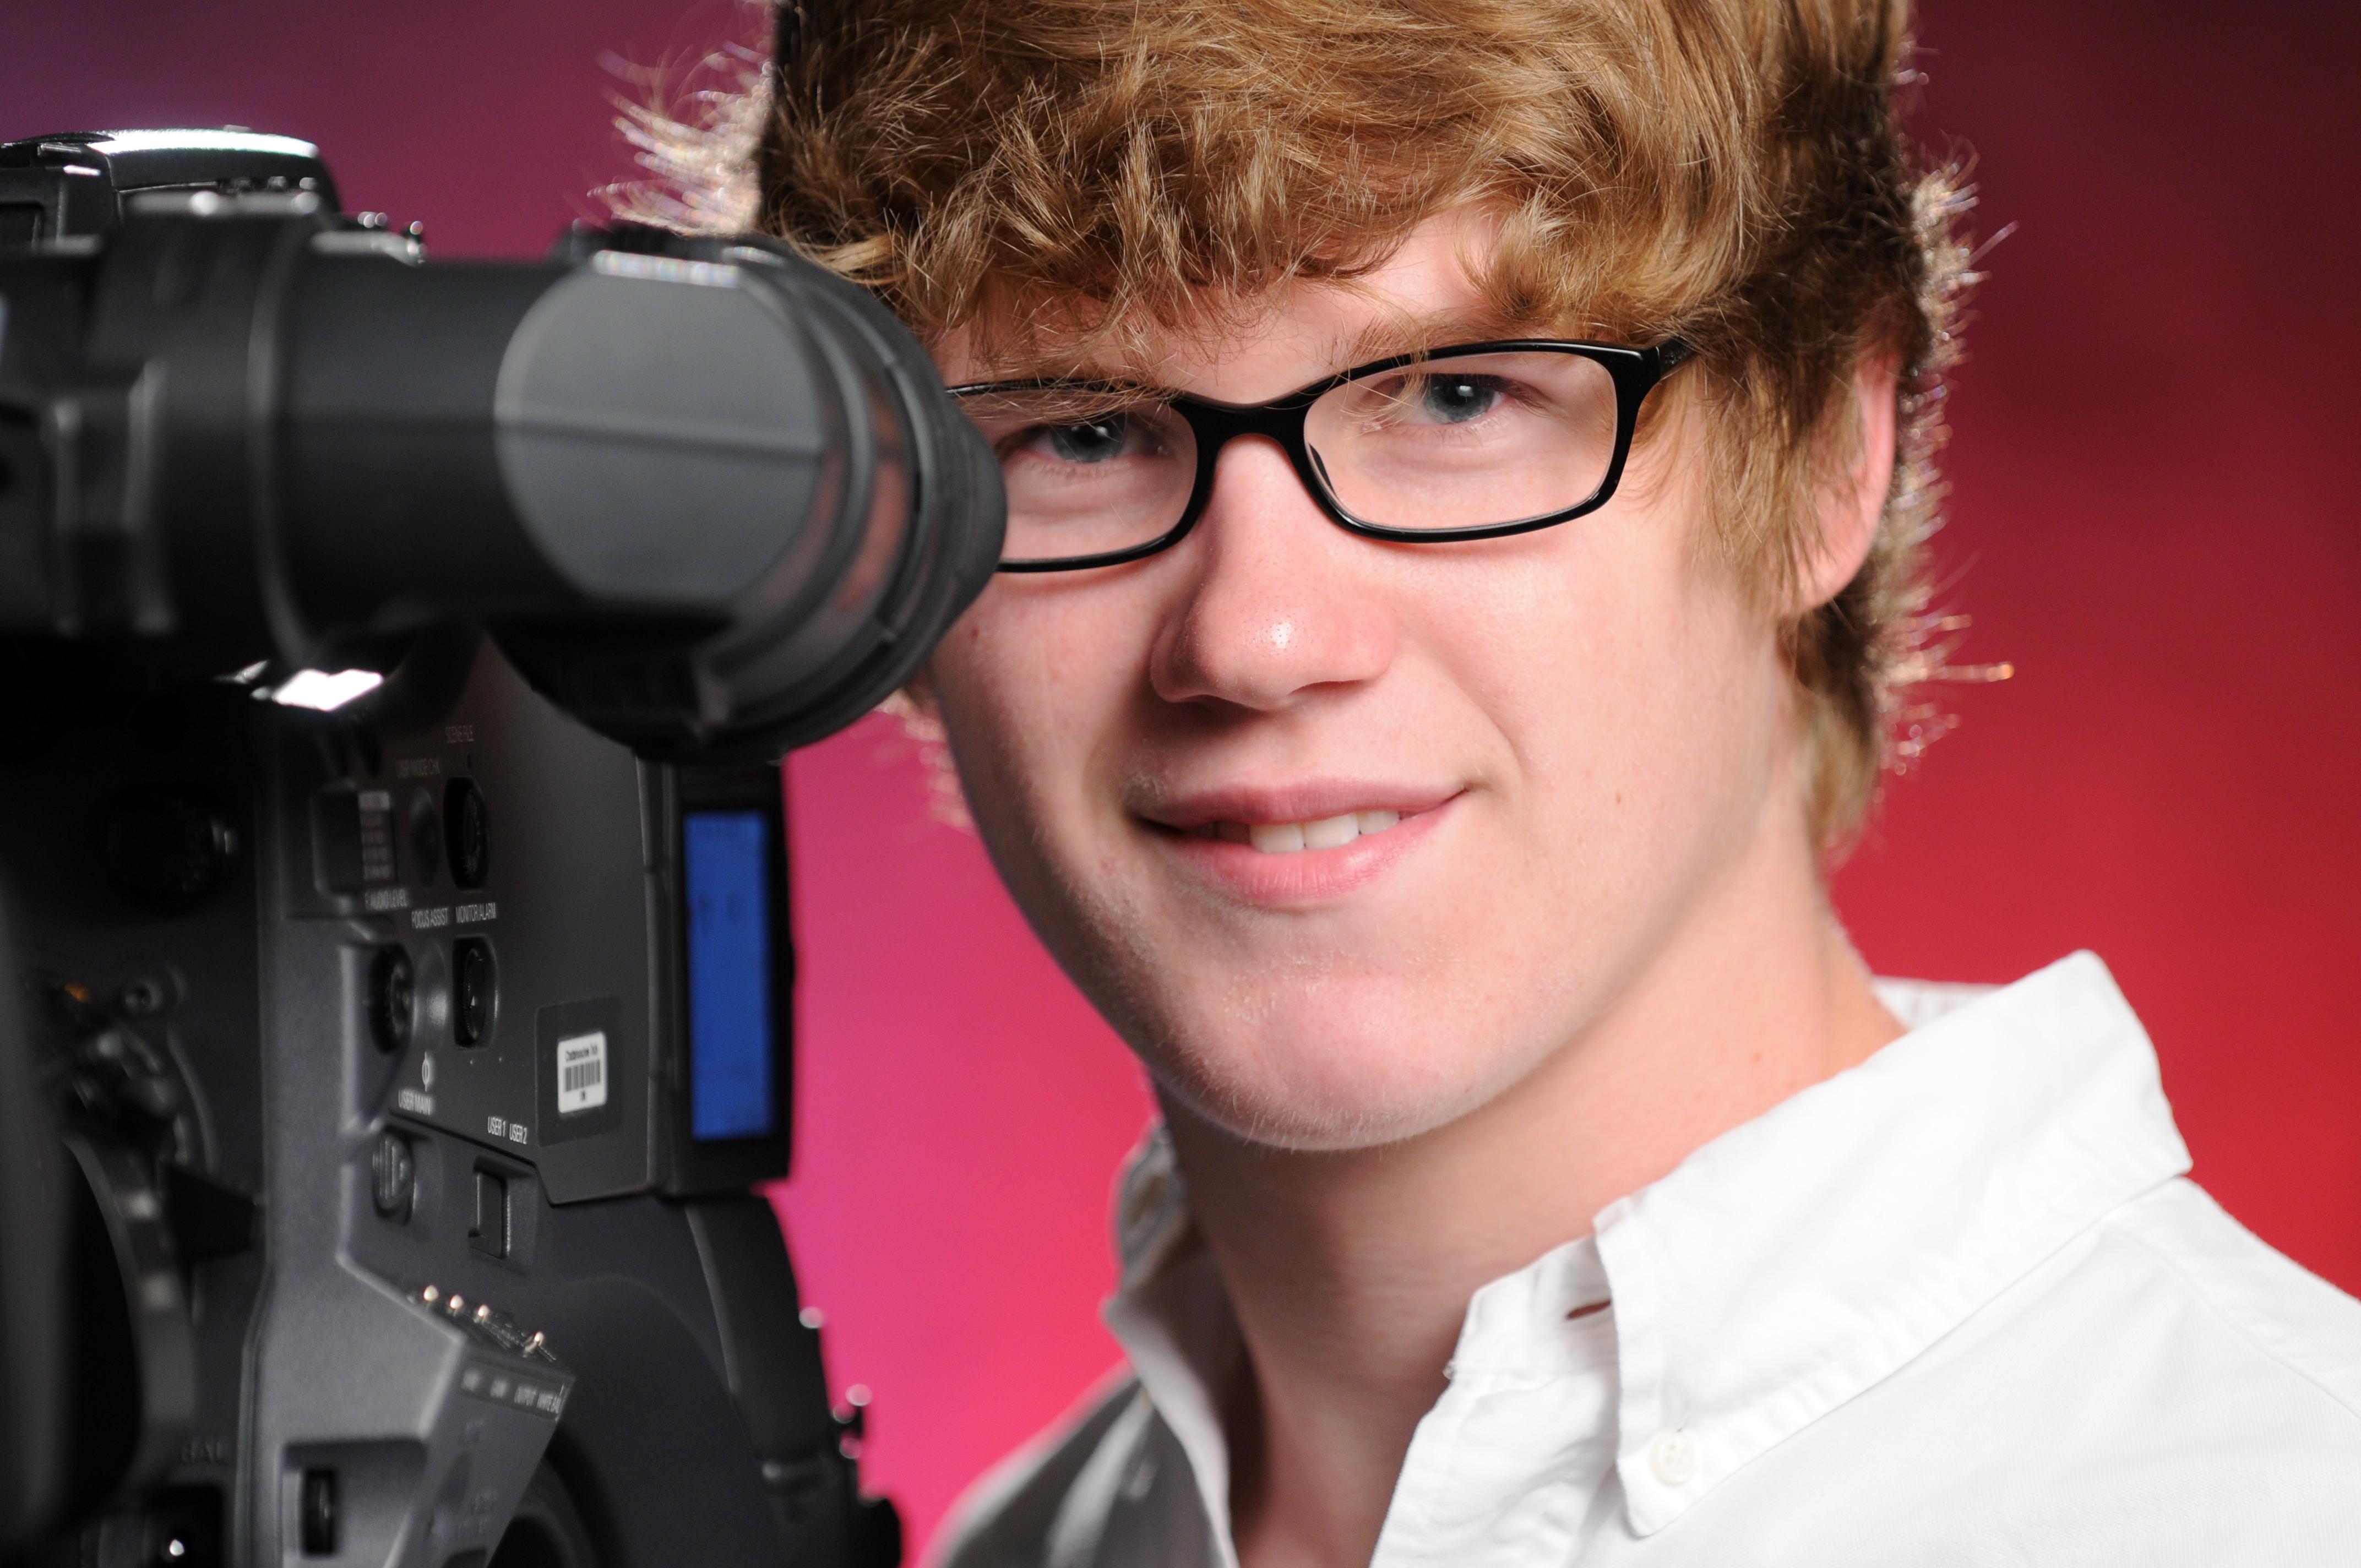 Student using camera